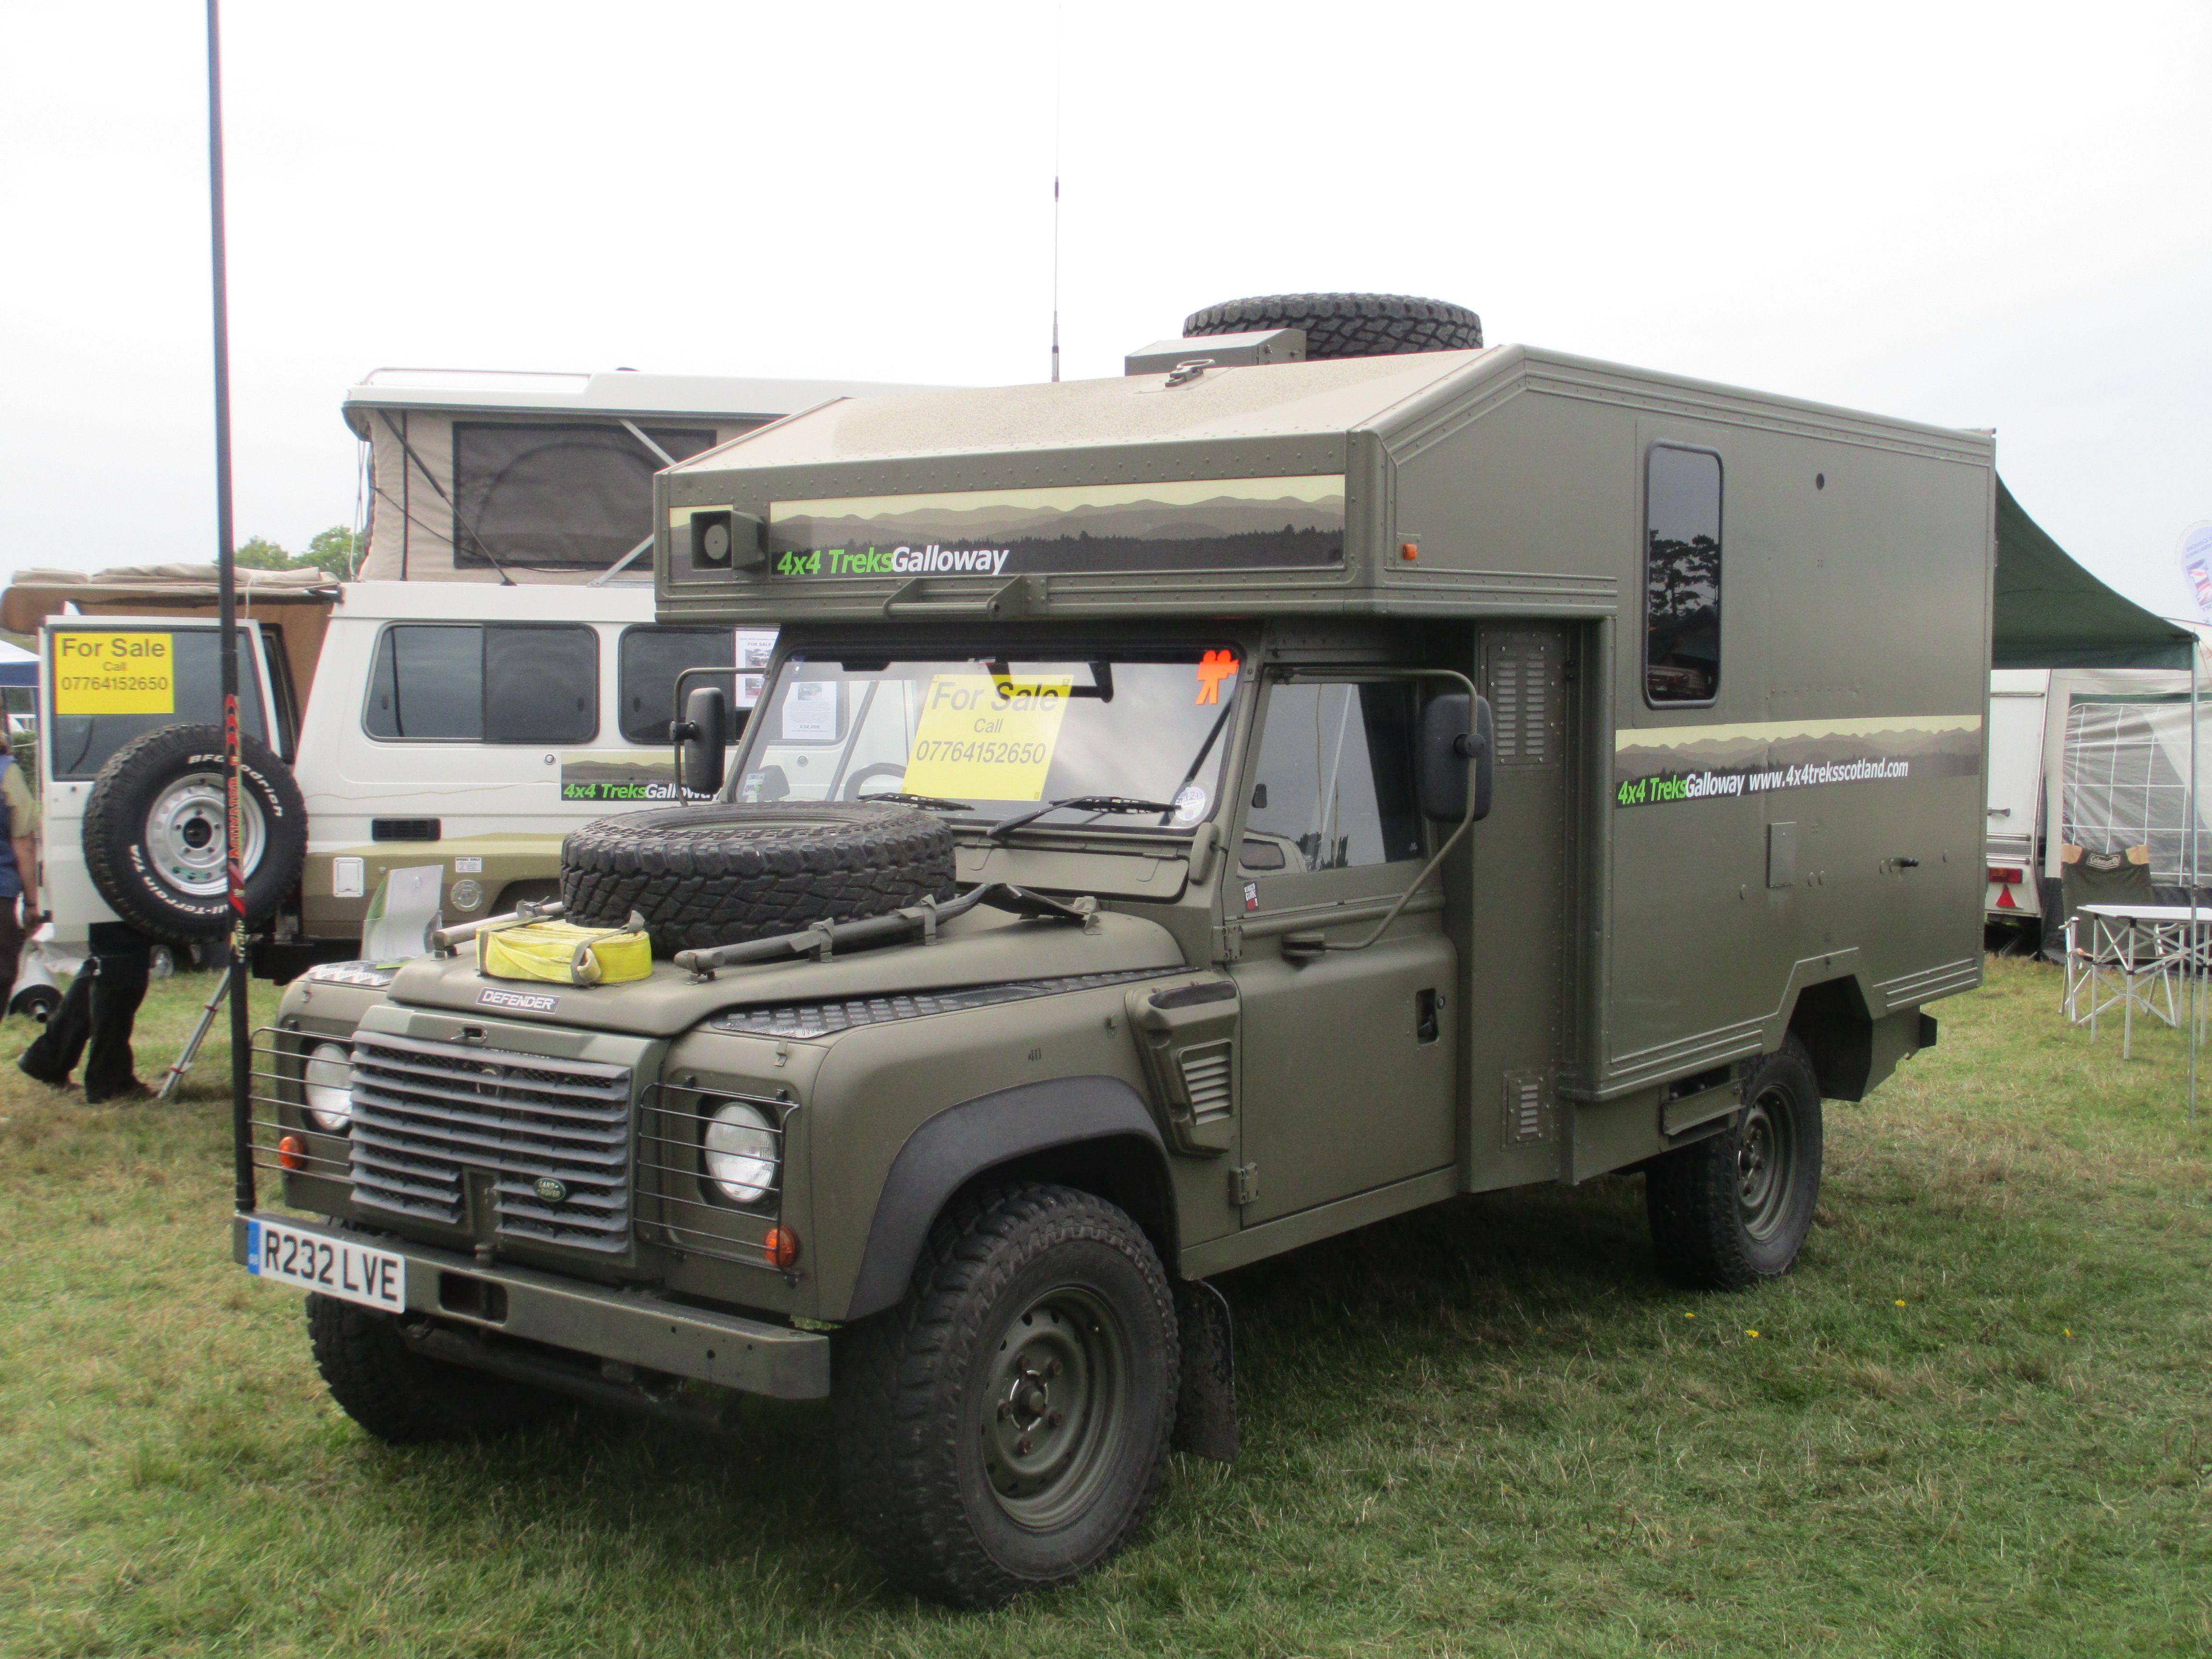 Landrover 130 Ambulance Office 4x4 Adventure Camper Car Land